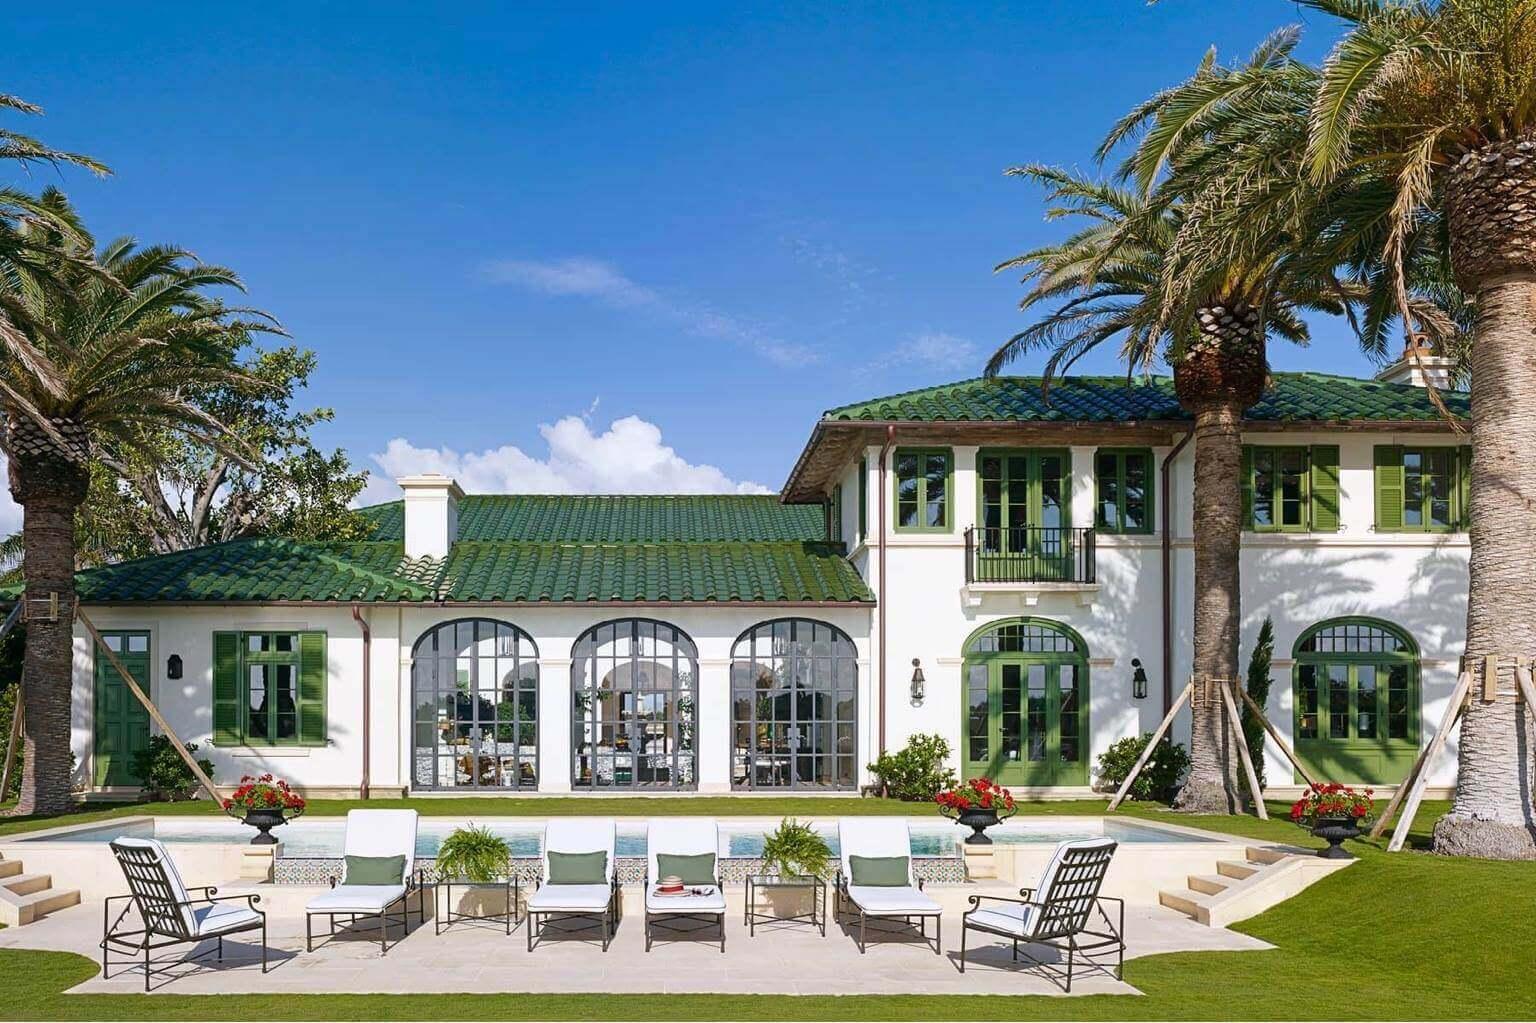 Fairfax and Sammons, Palm Beach Ludowici Roof Tile